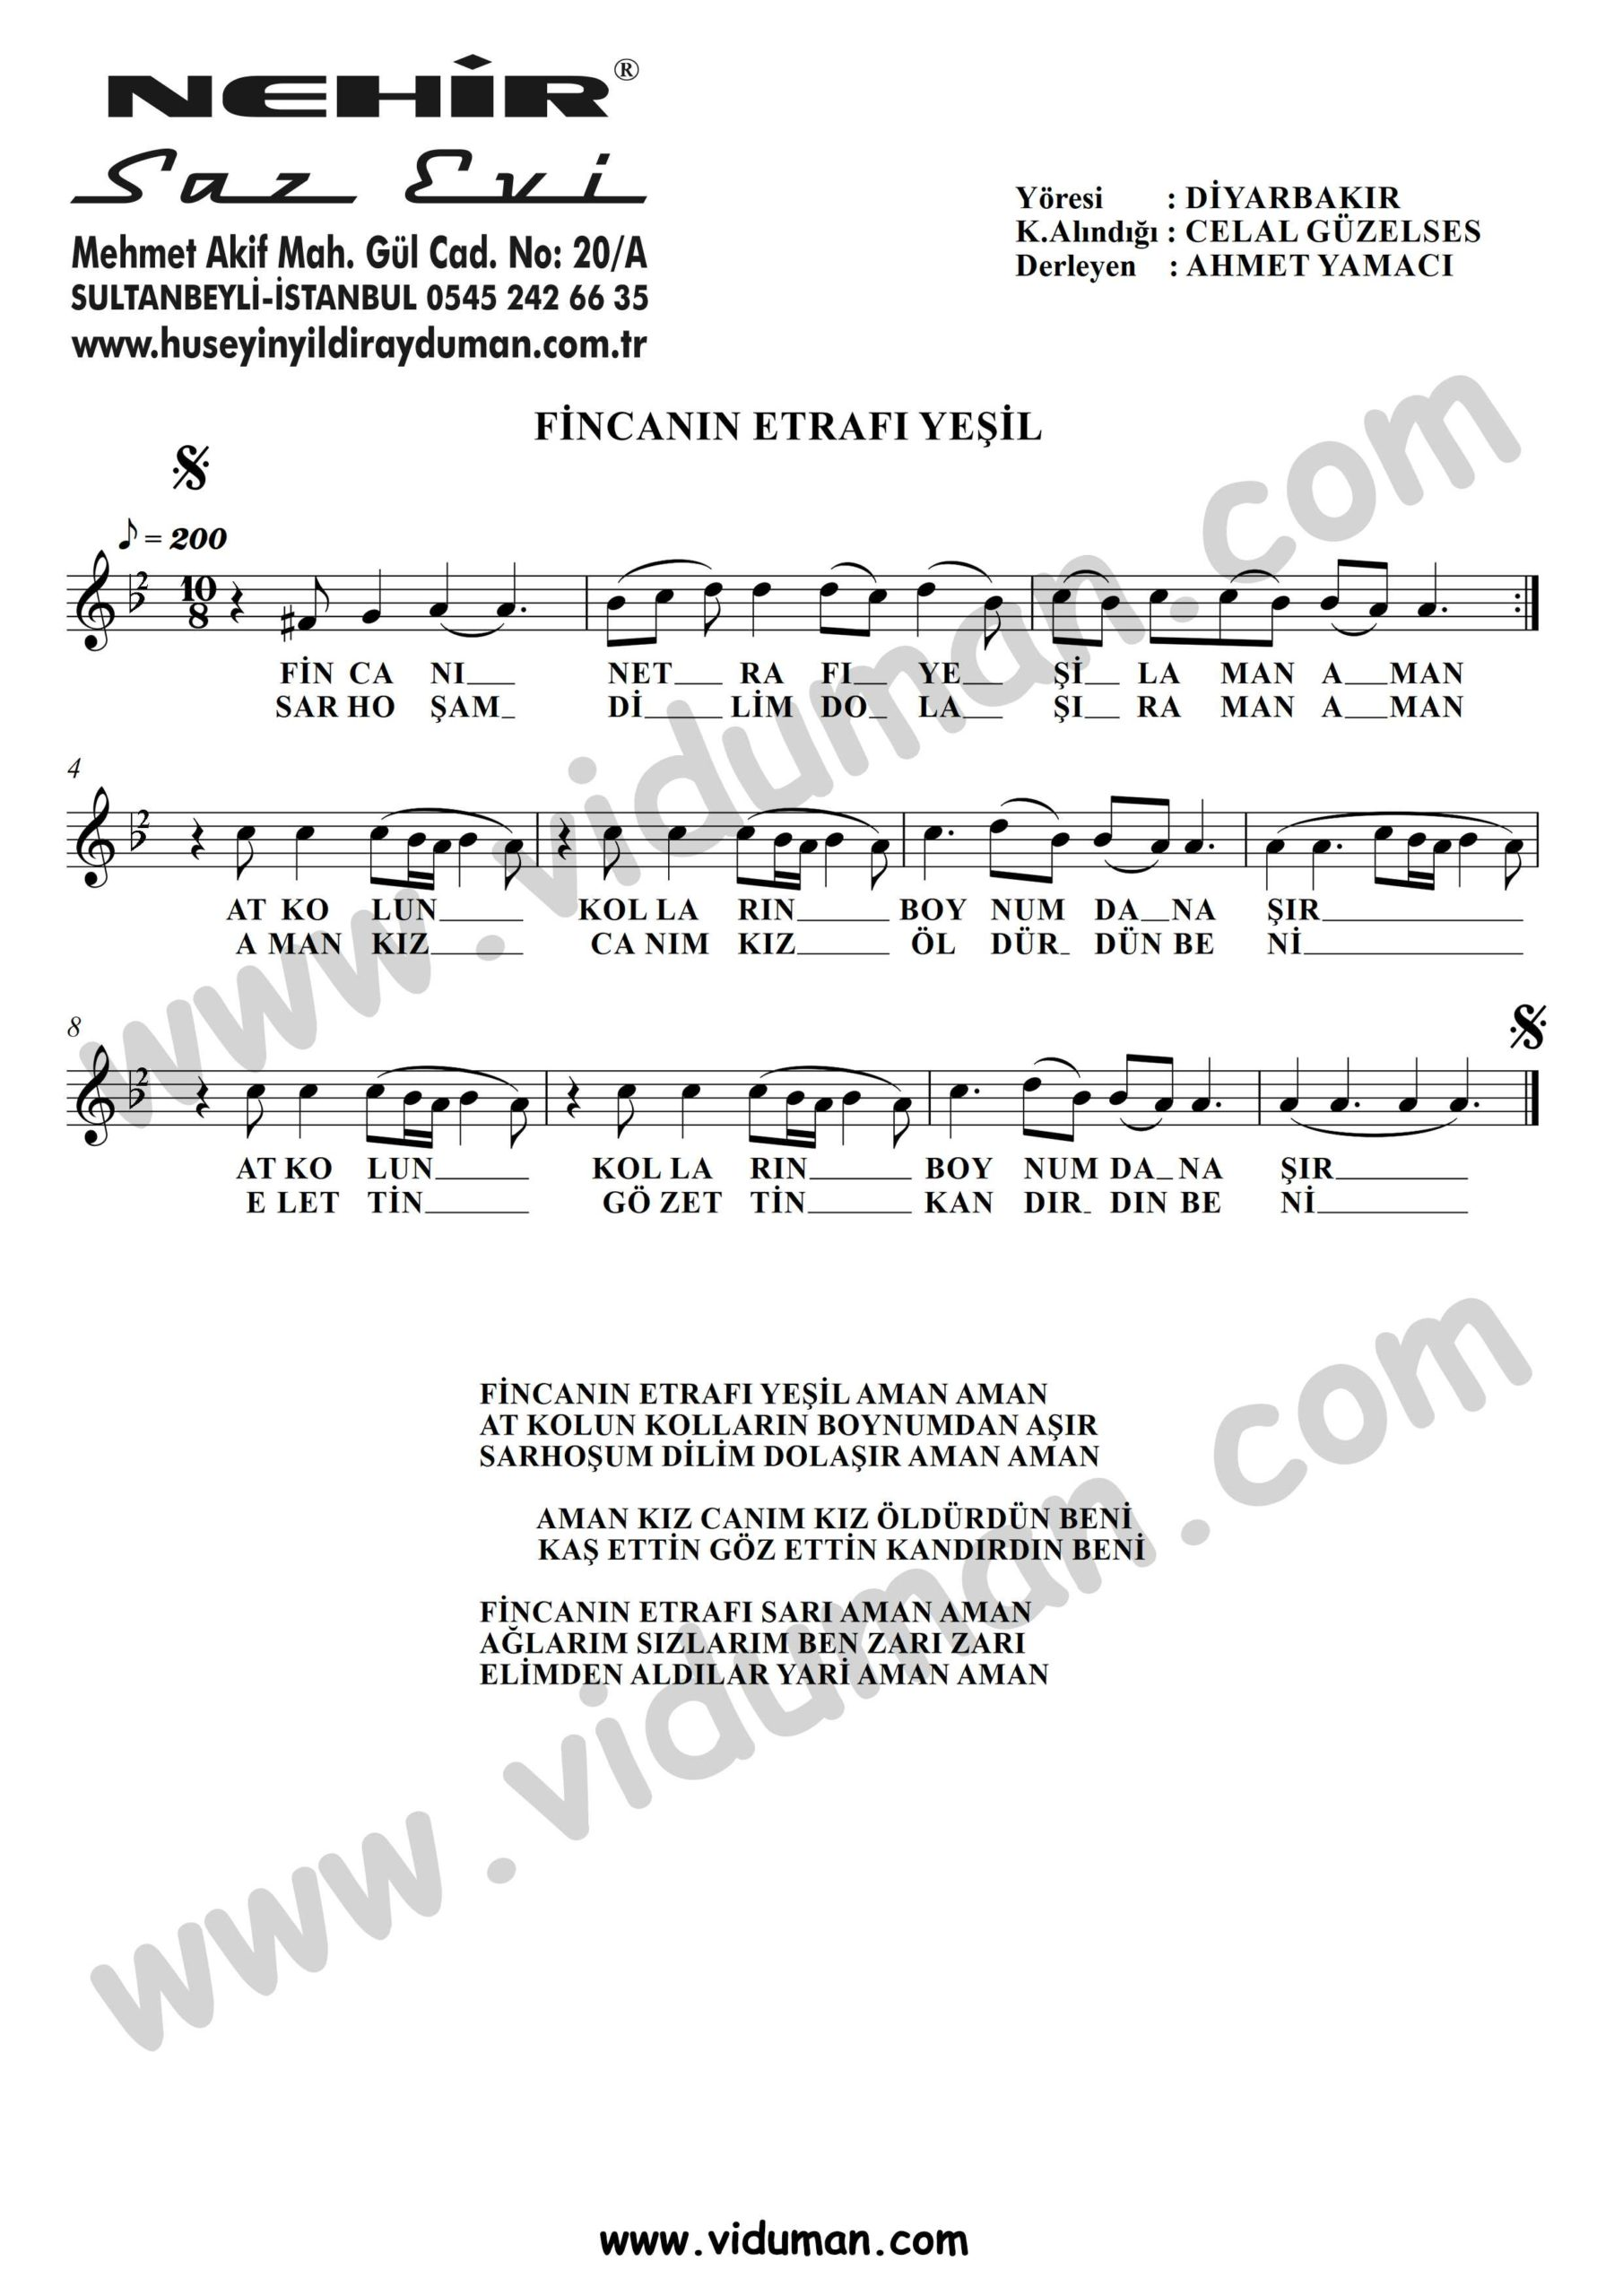 Fincanin-Etrafi-Yesil-Baglama-Saz-Notalari